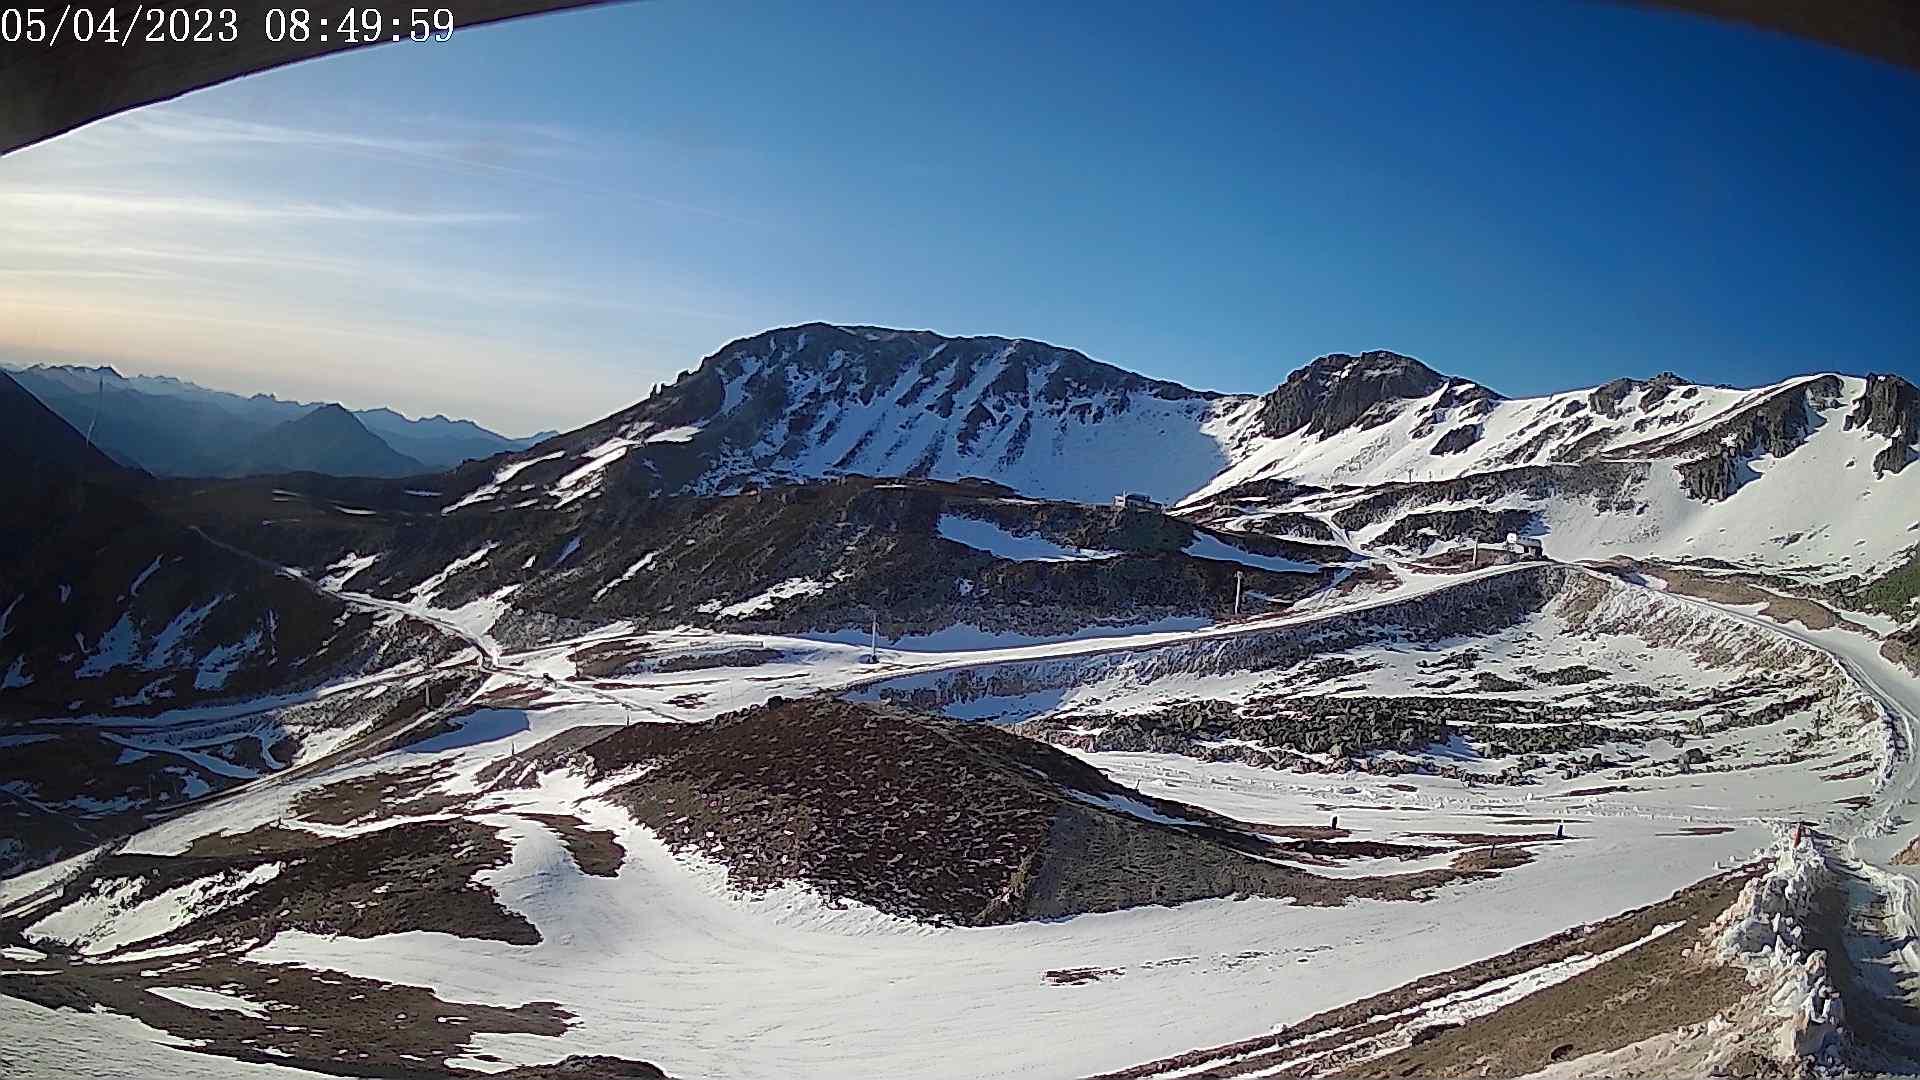 Webcam de Cebolledo 2.000m.